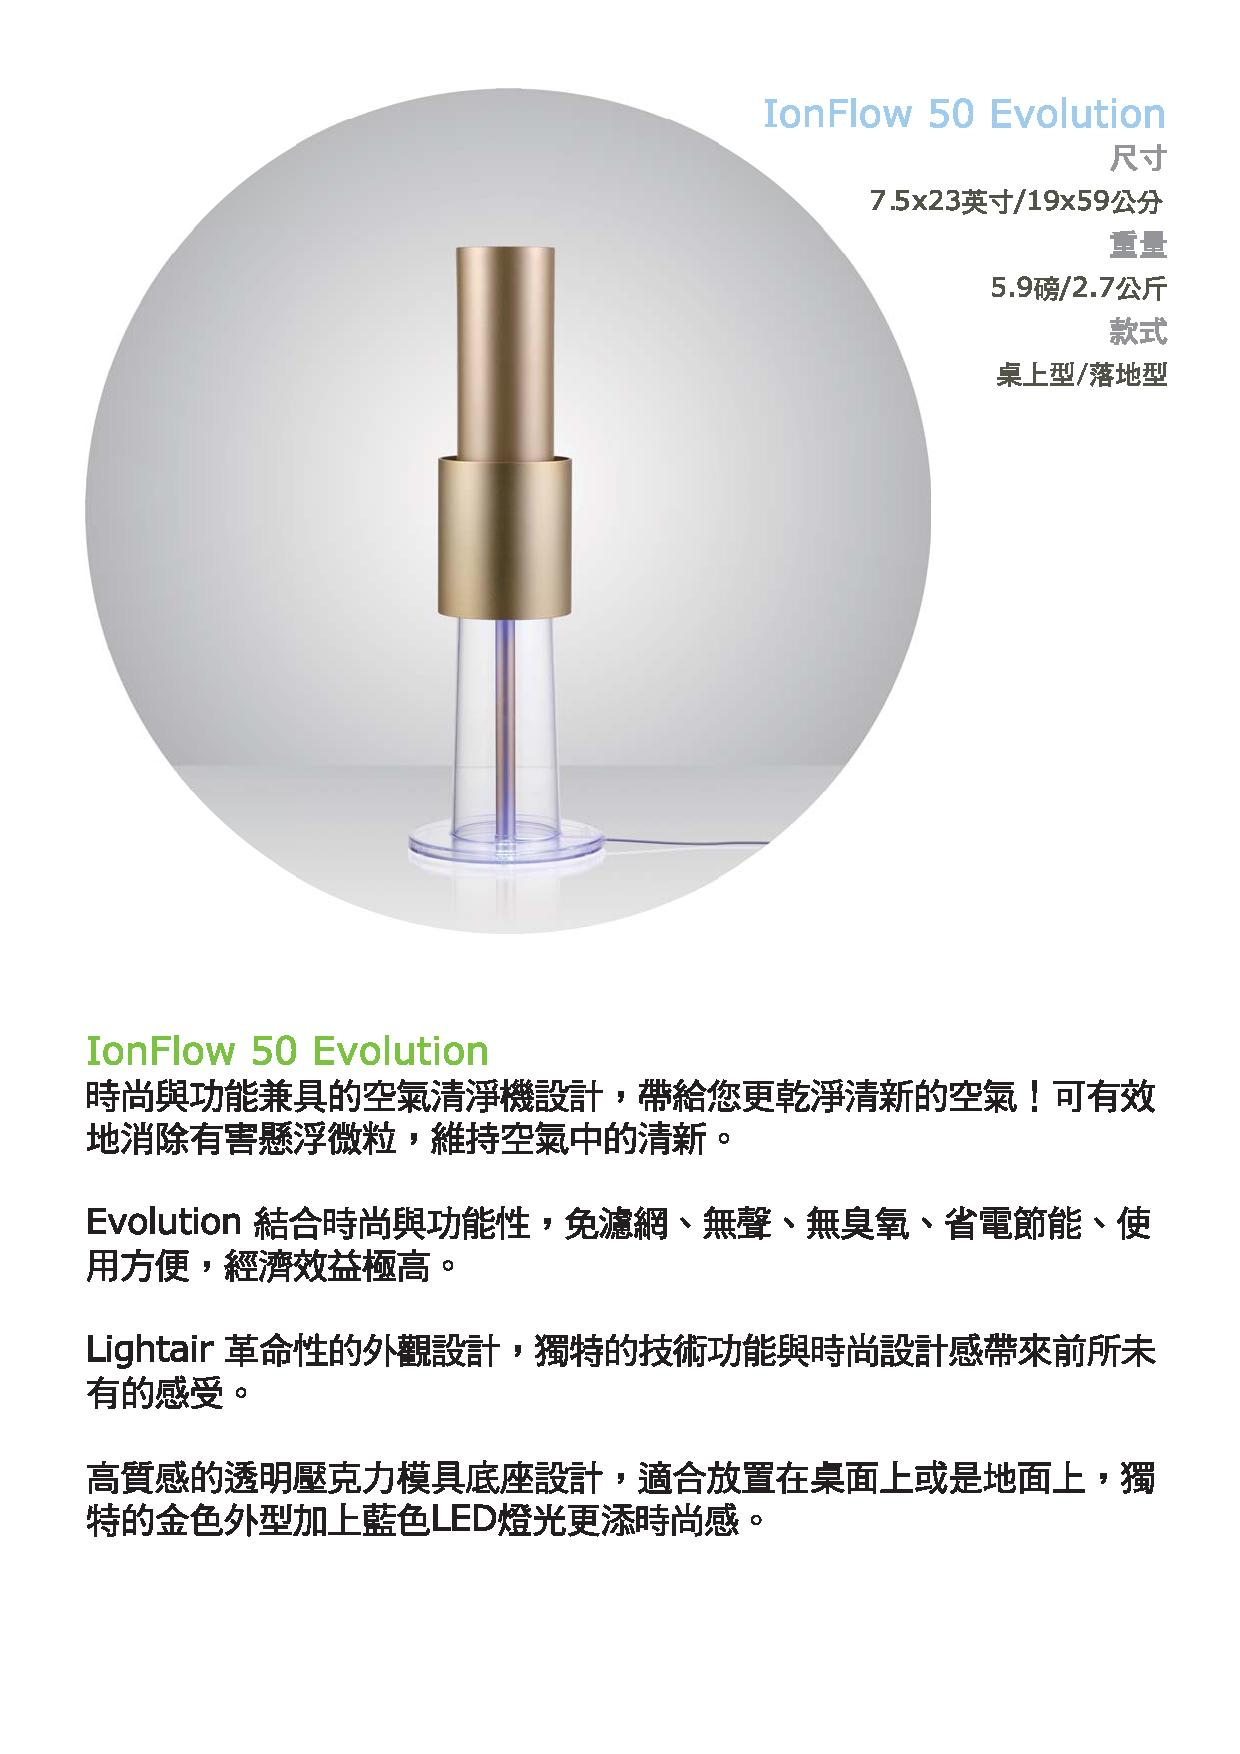 Lightair IonFlow 50 Evolution Gold 空氣清新機 (建議使用面積 540尺)